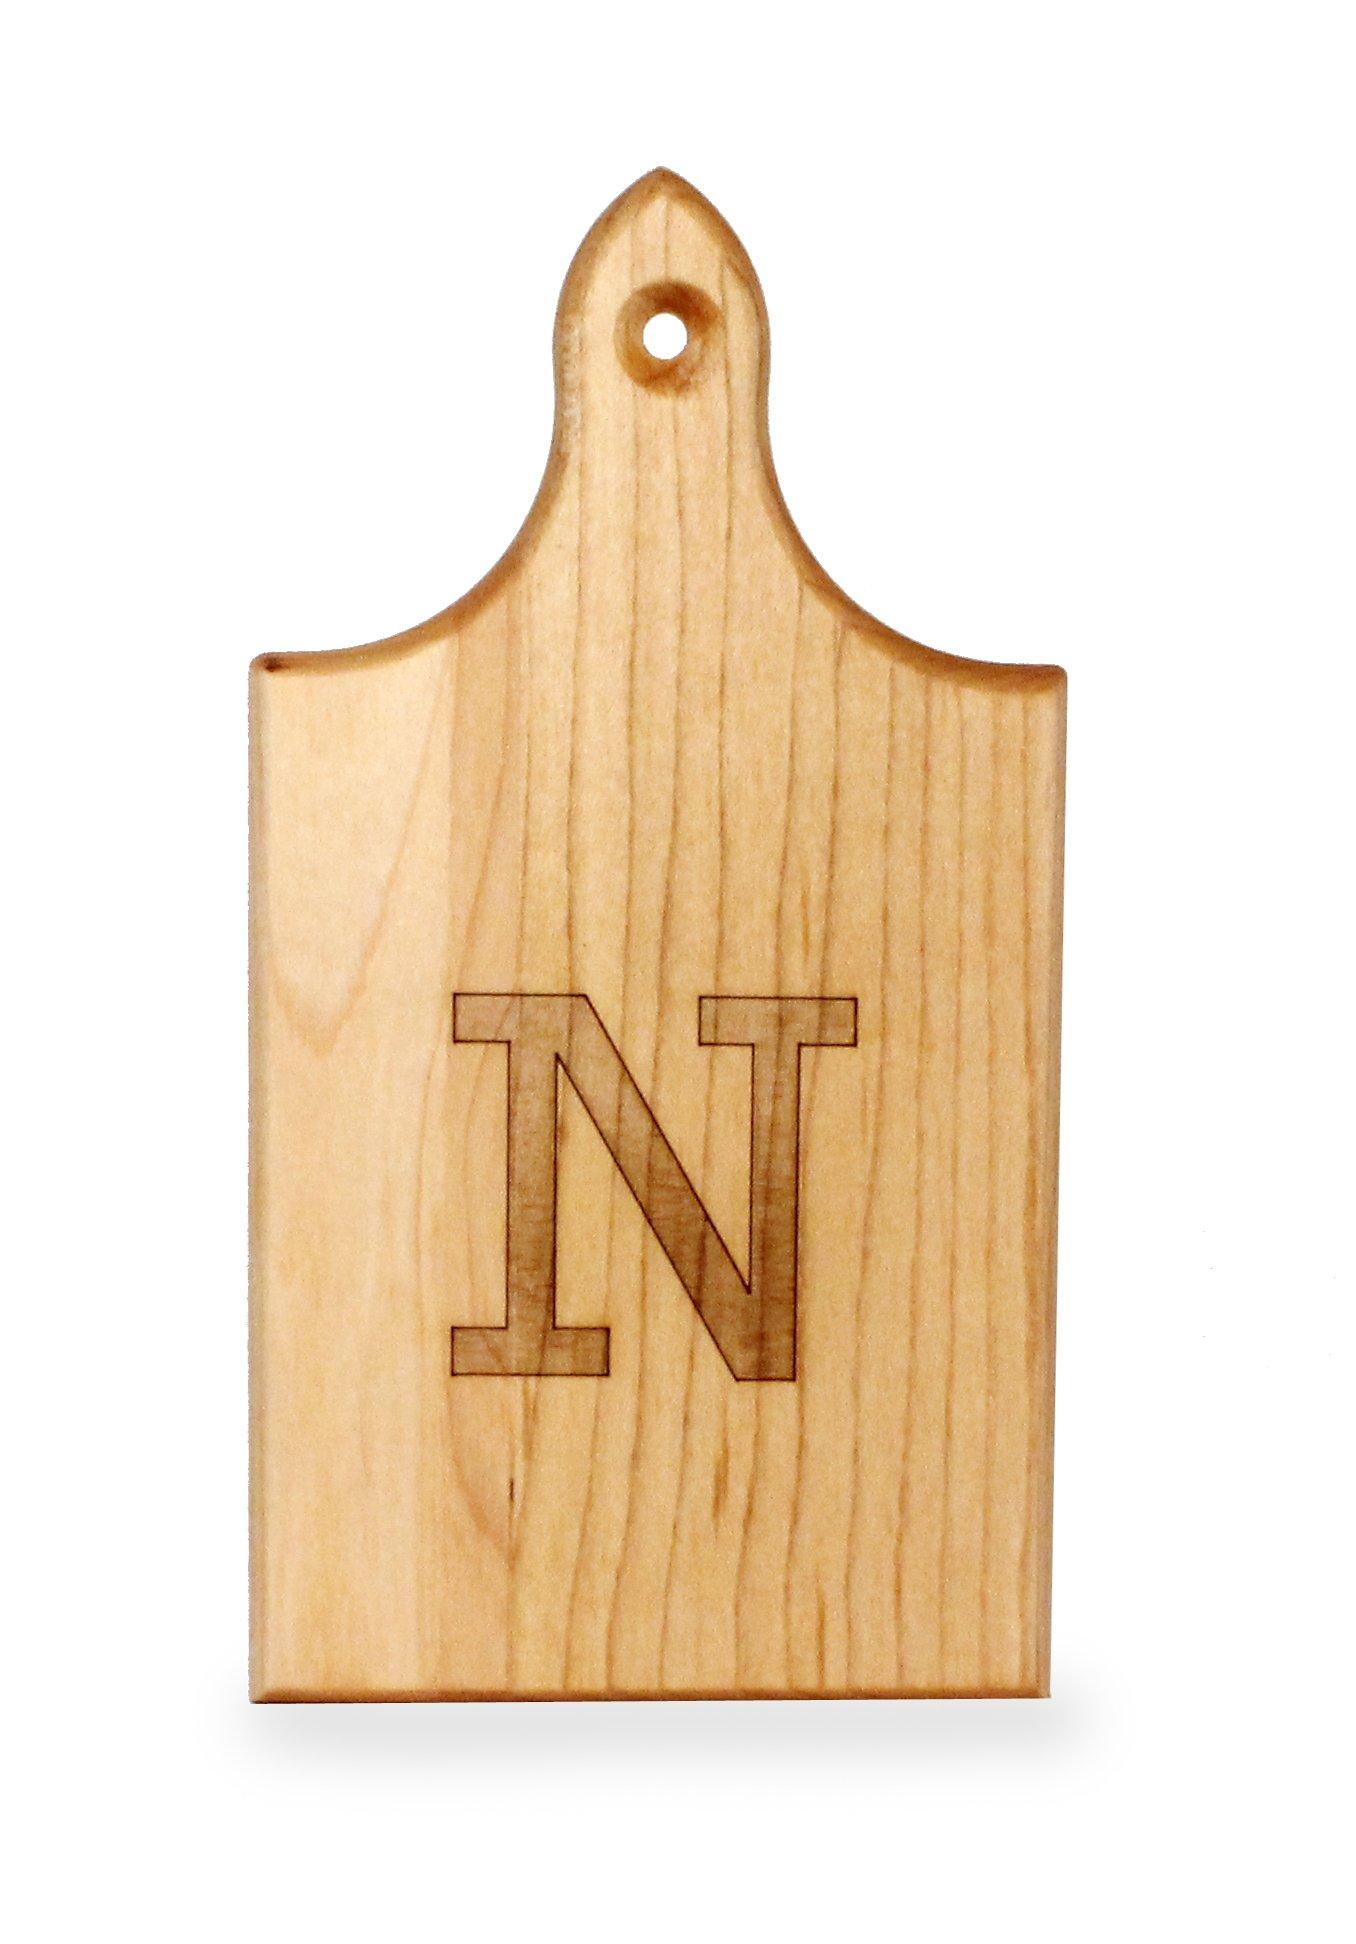 J.K. Adams Q-Tee Cut-Up Sugar Maple Wood Cutting Board, 7-1/2-inches by 4-inches, Alphabet Series, N